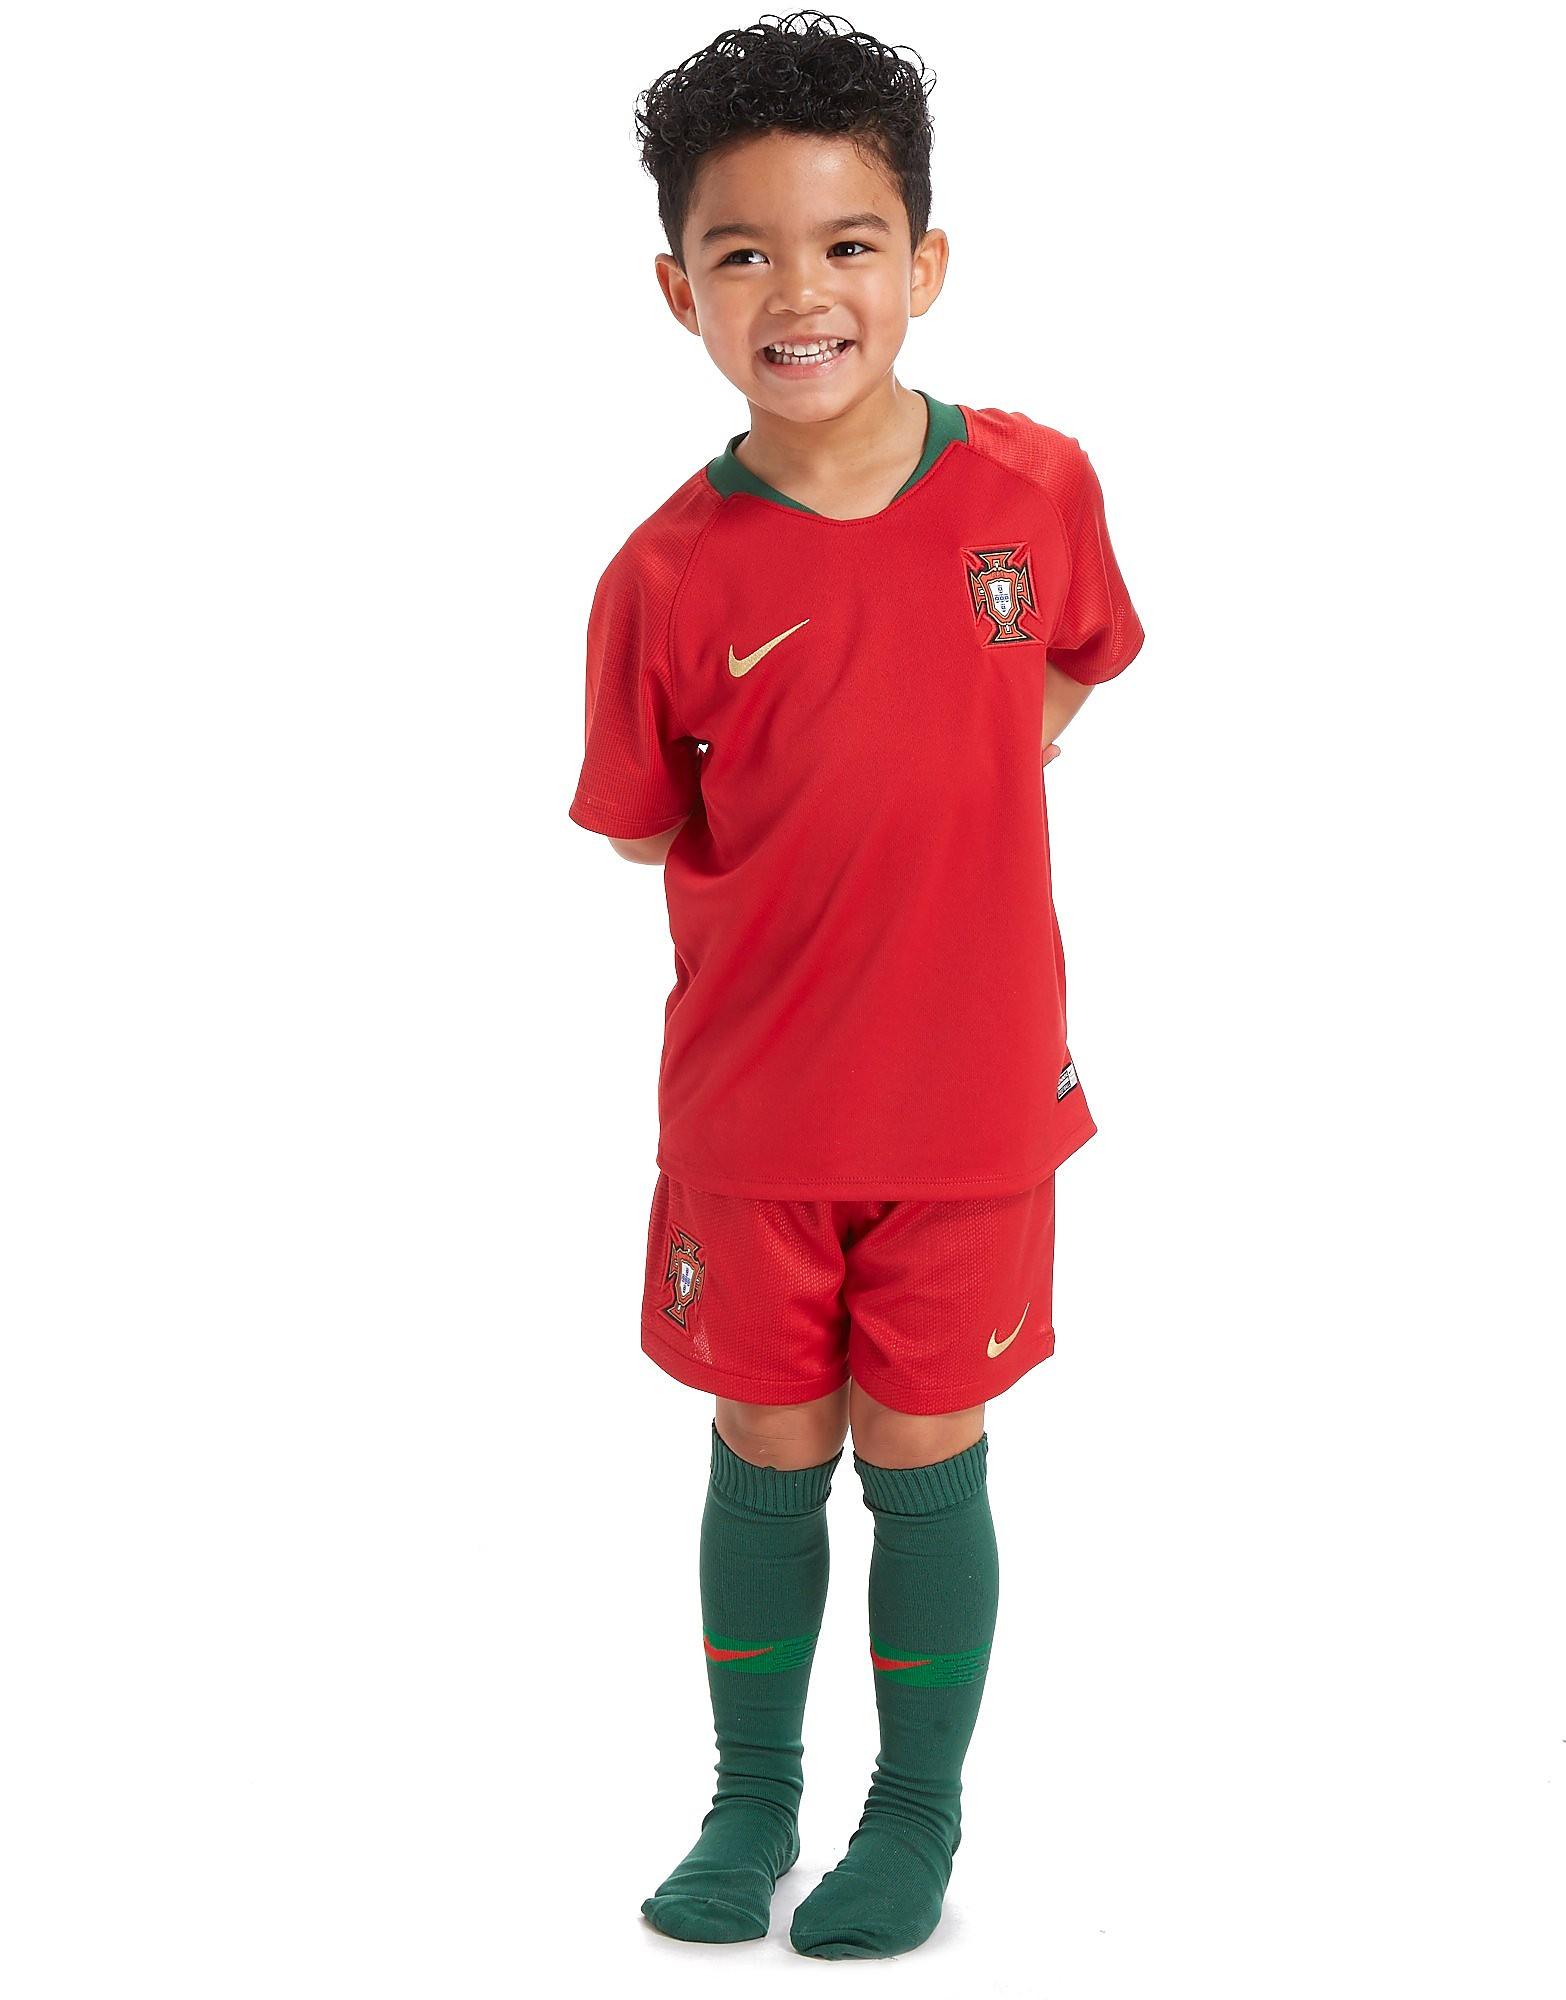 Nike Portugal 2018 Home Kit Children